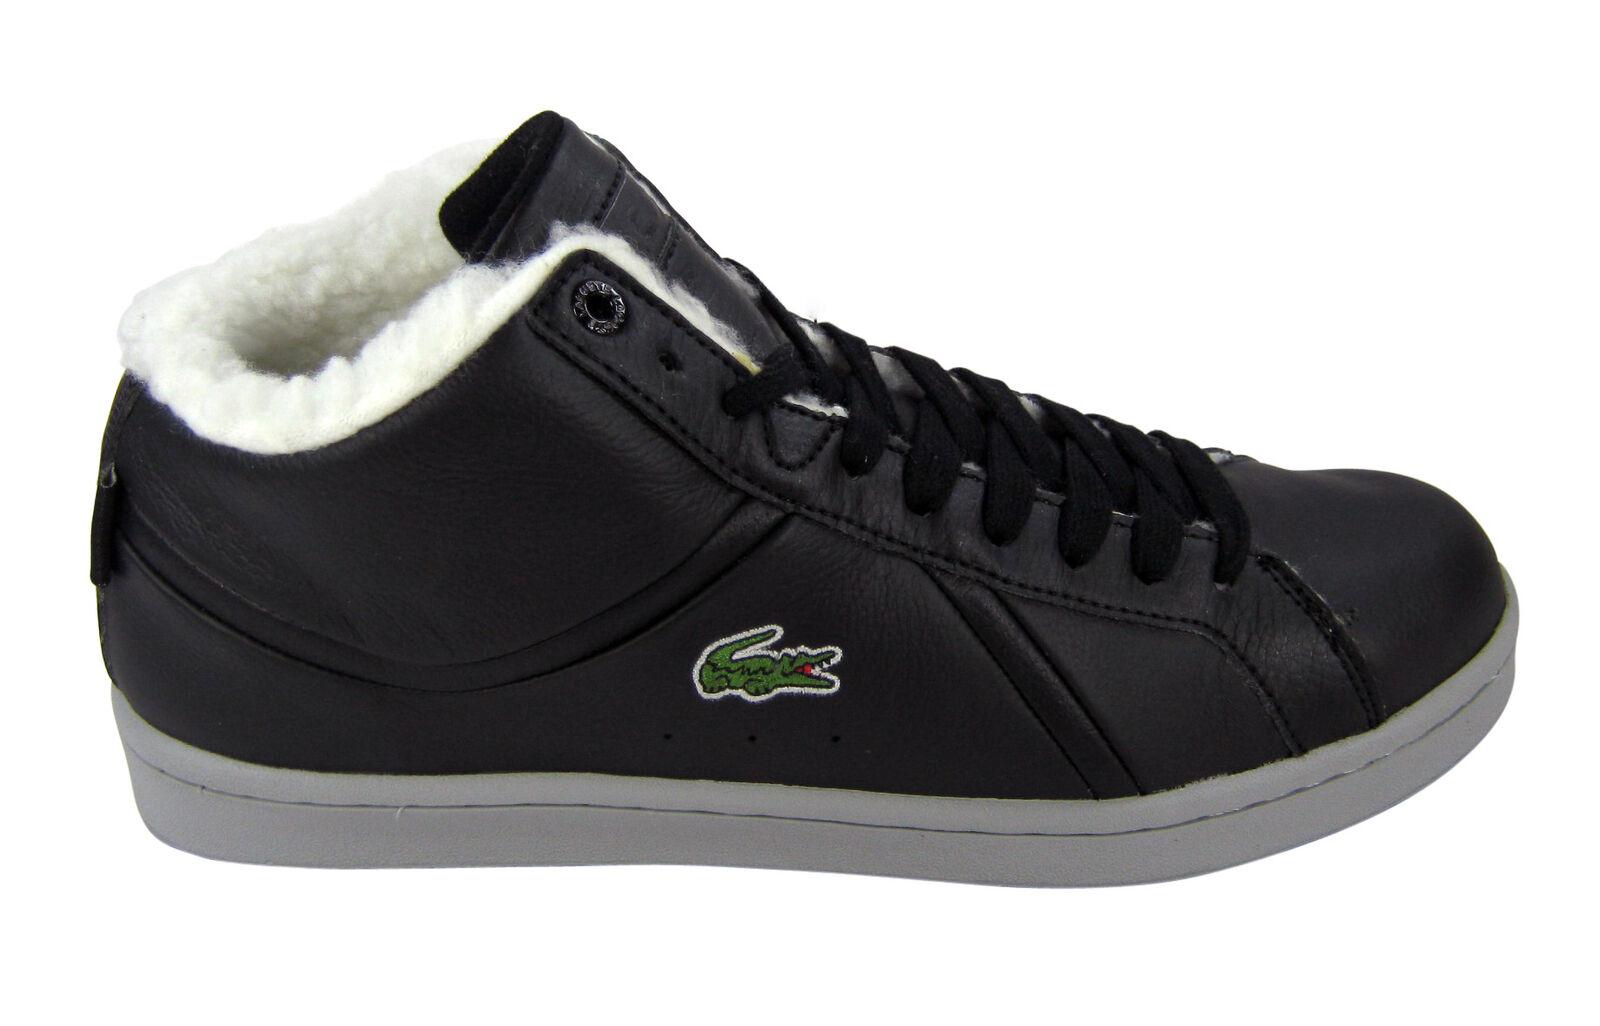 Lacoste Bryont Mid AG SPM black/schwarz Schuhe/Sneaker BLK LTH SYN